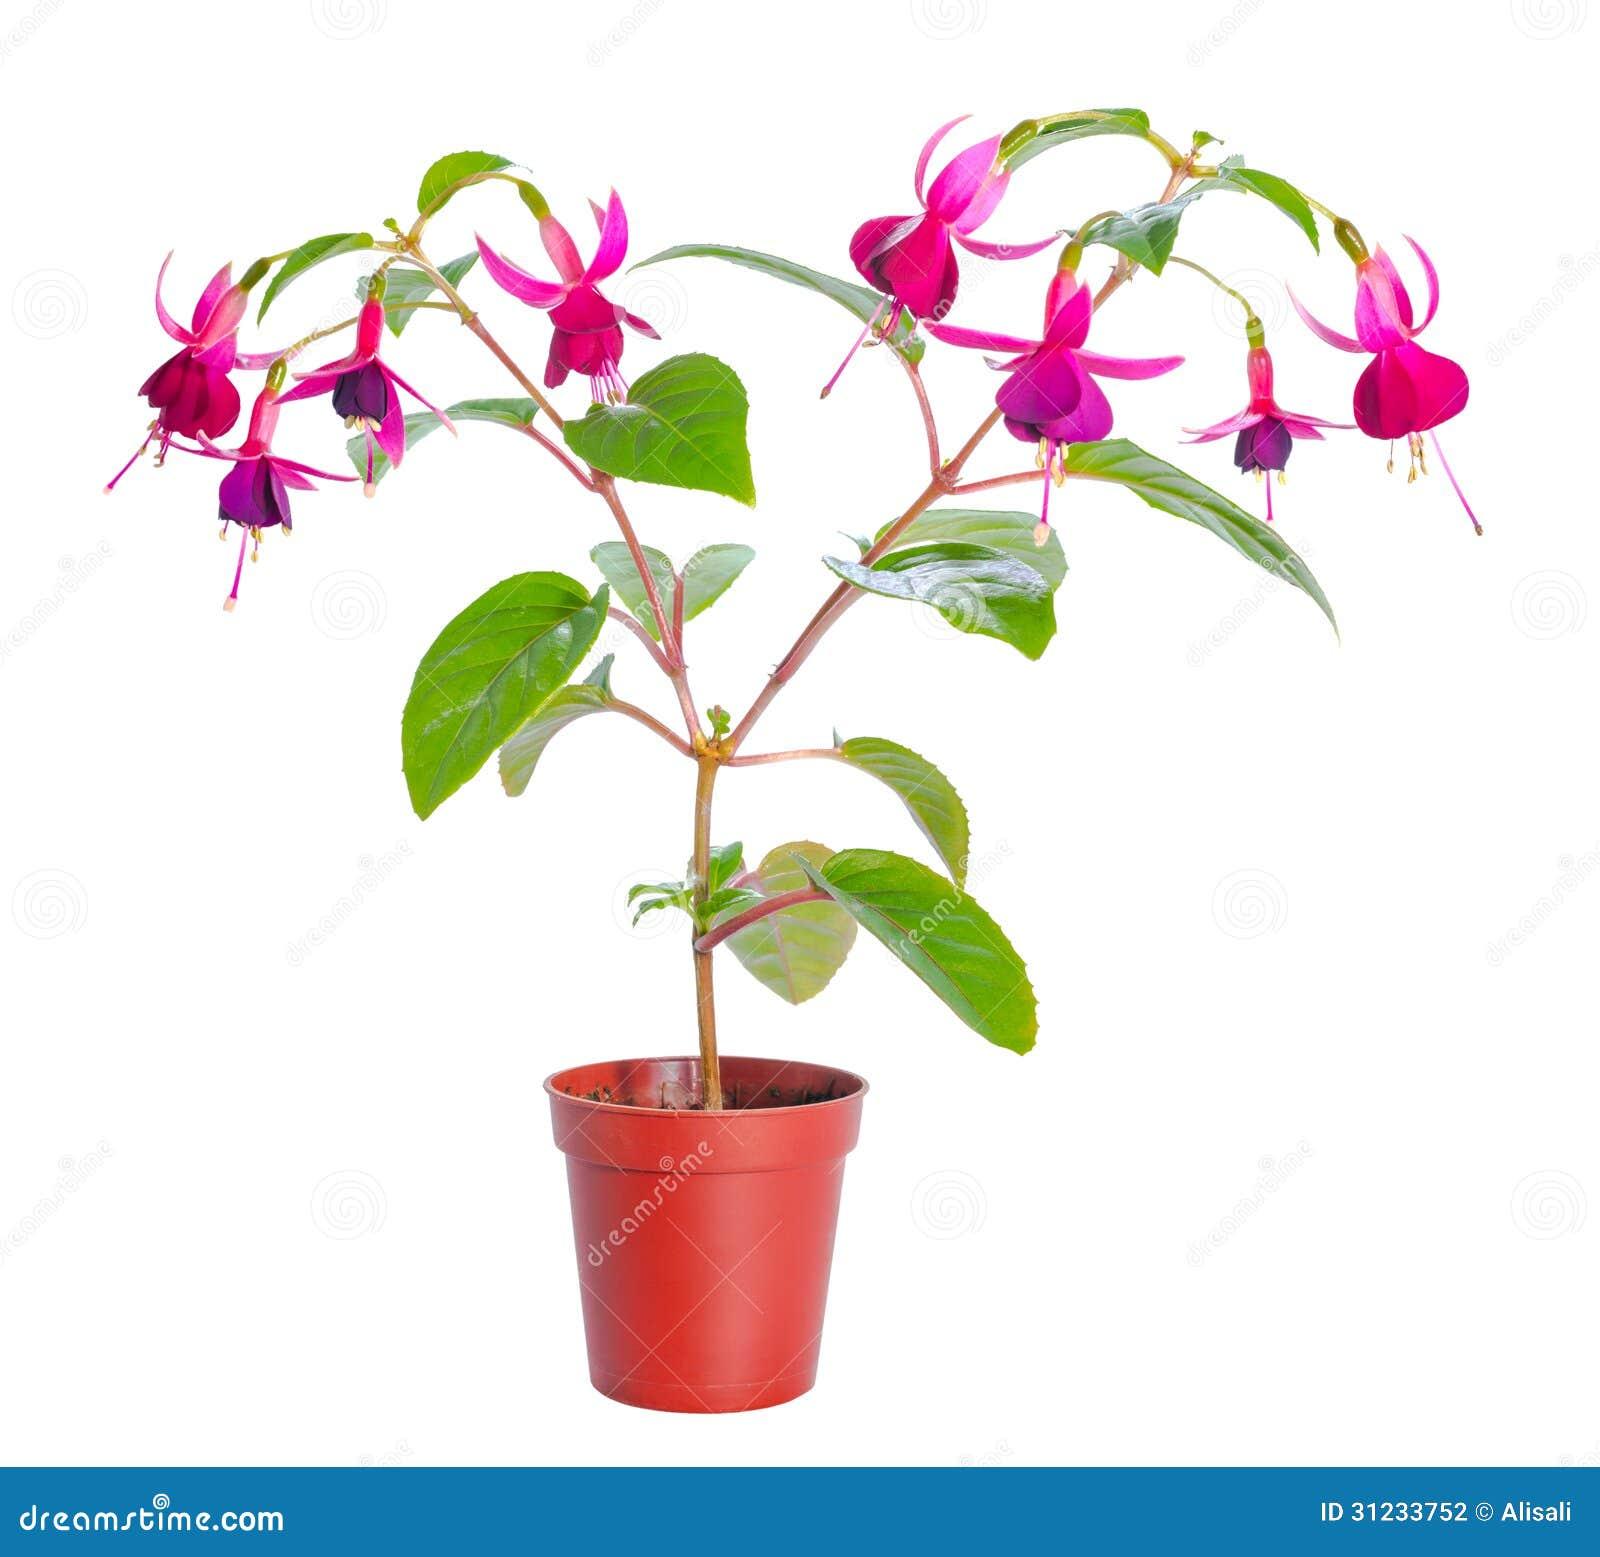 Fuchsia Flower Houseplants In Flower Pot Stock Photo Image Of